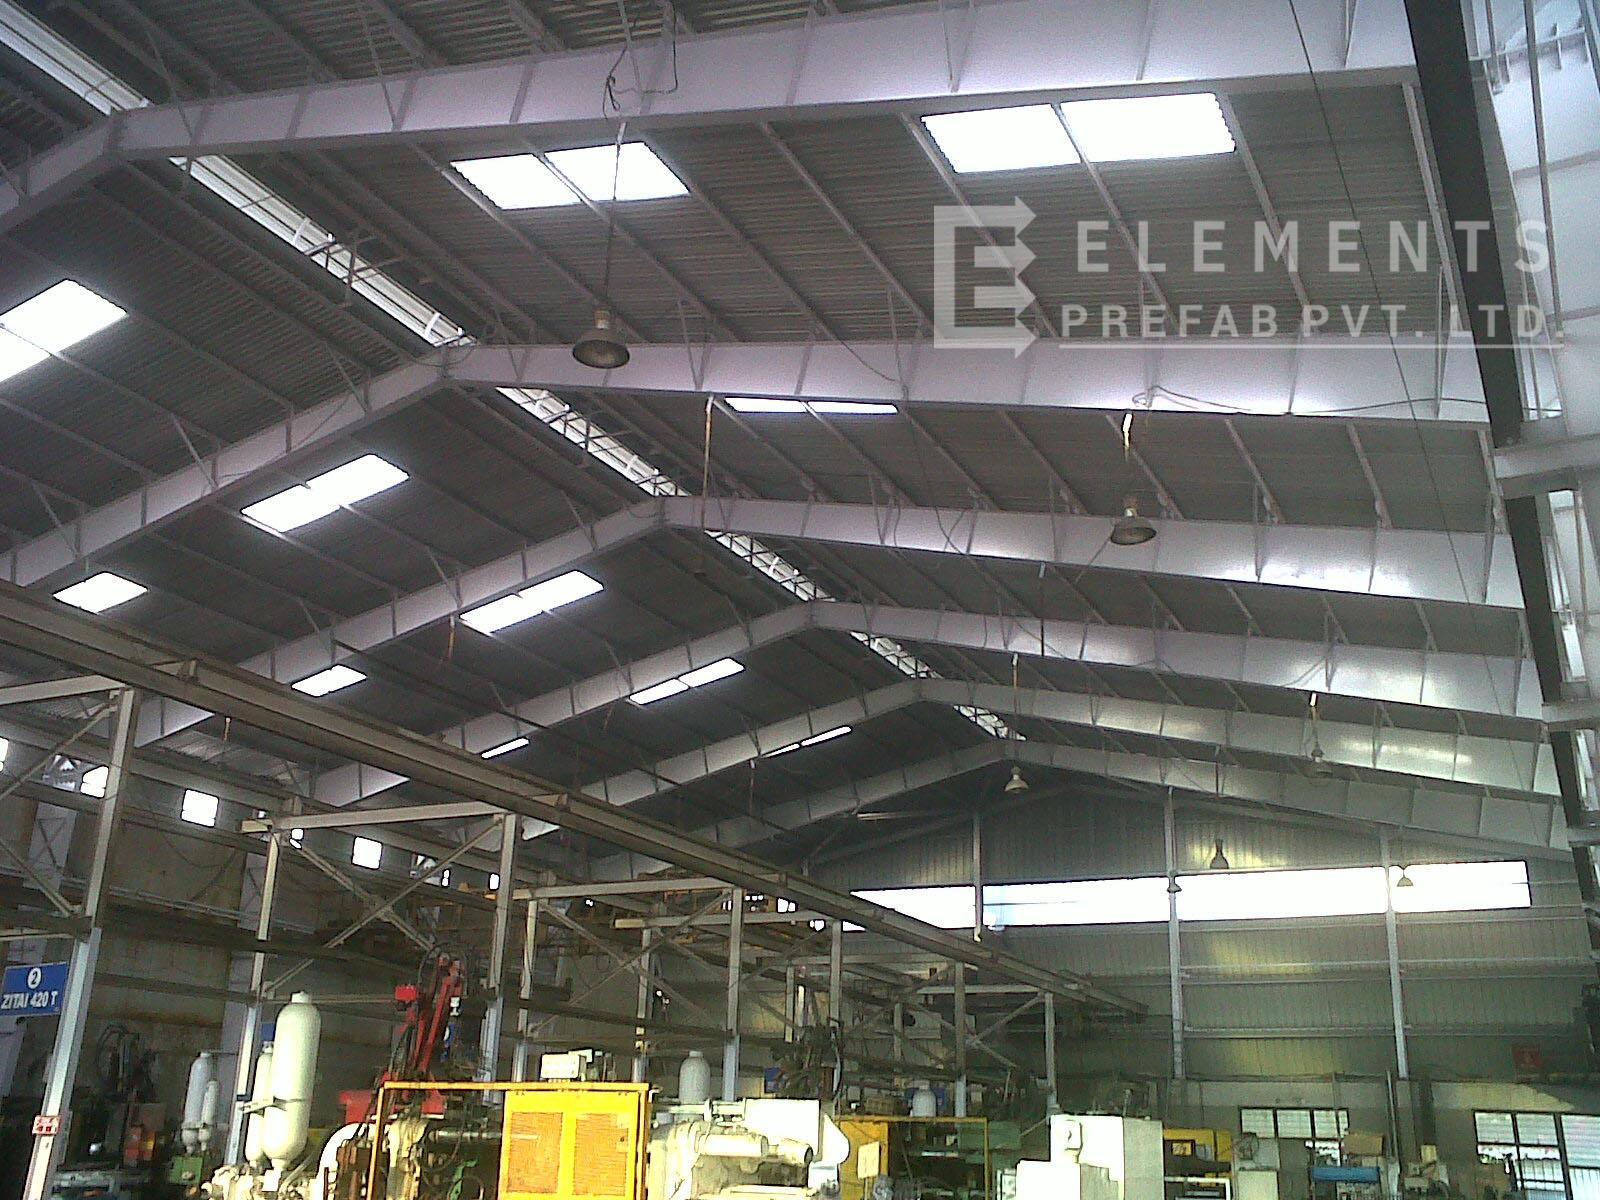 Aurangabad Electricals Ltd., Chakan